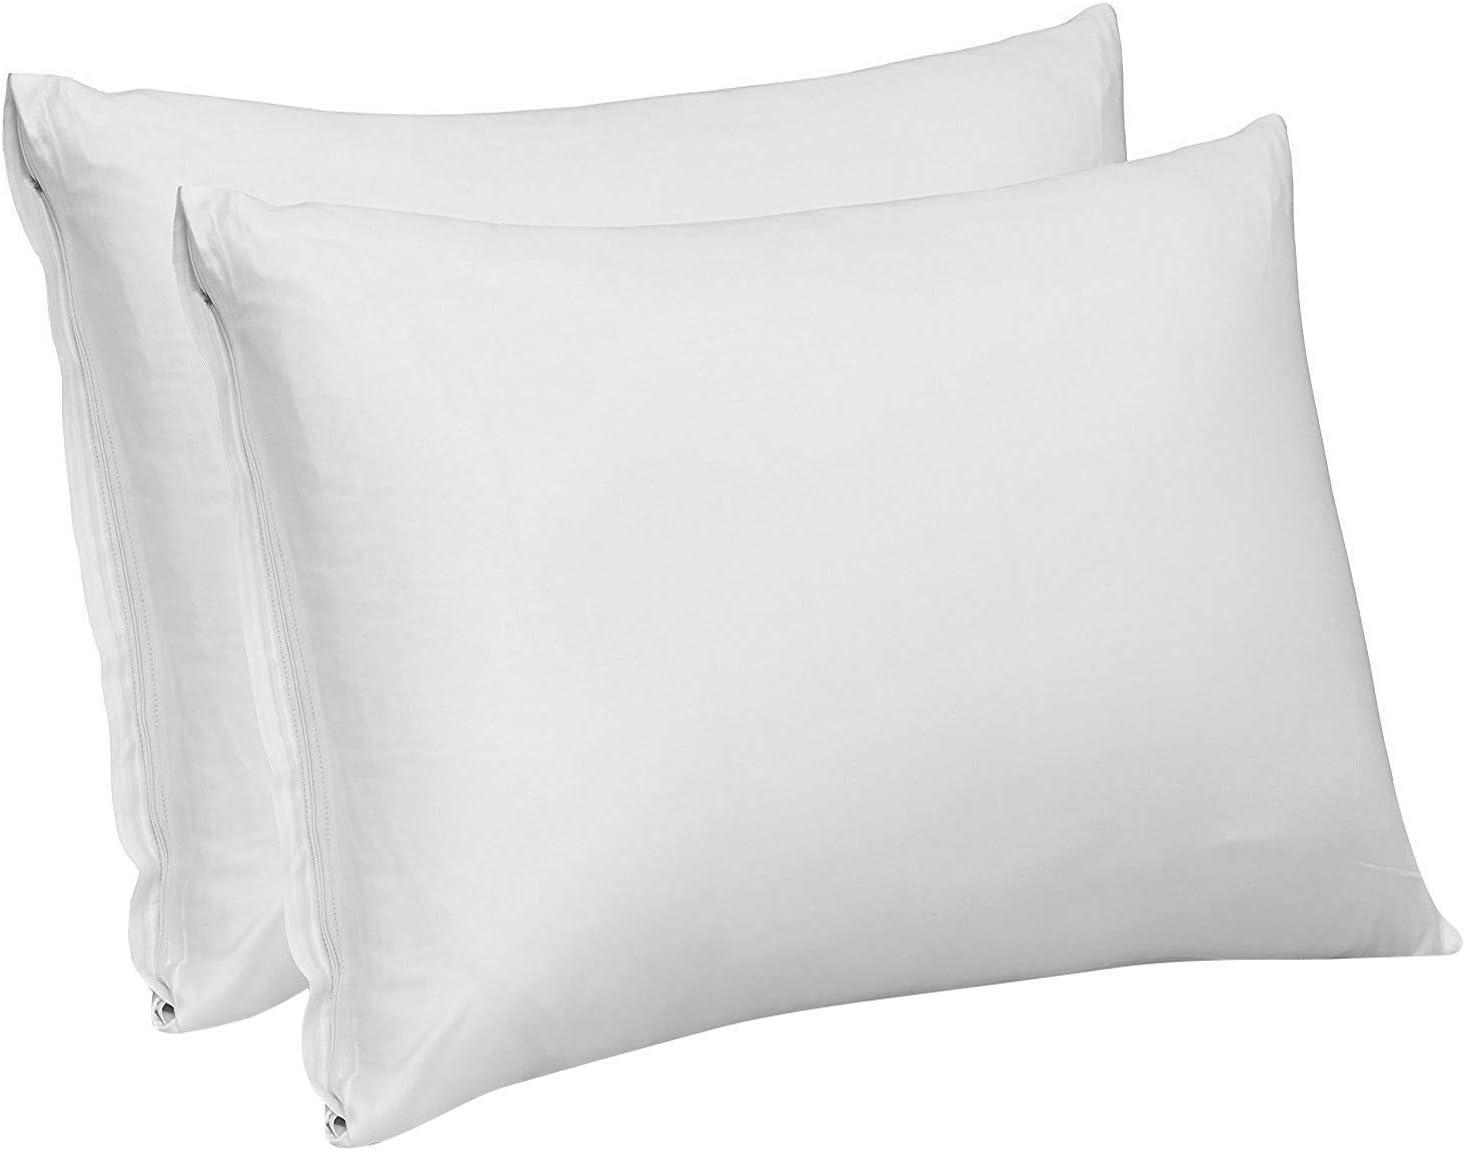 Pillow Protectors with Zip 100